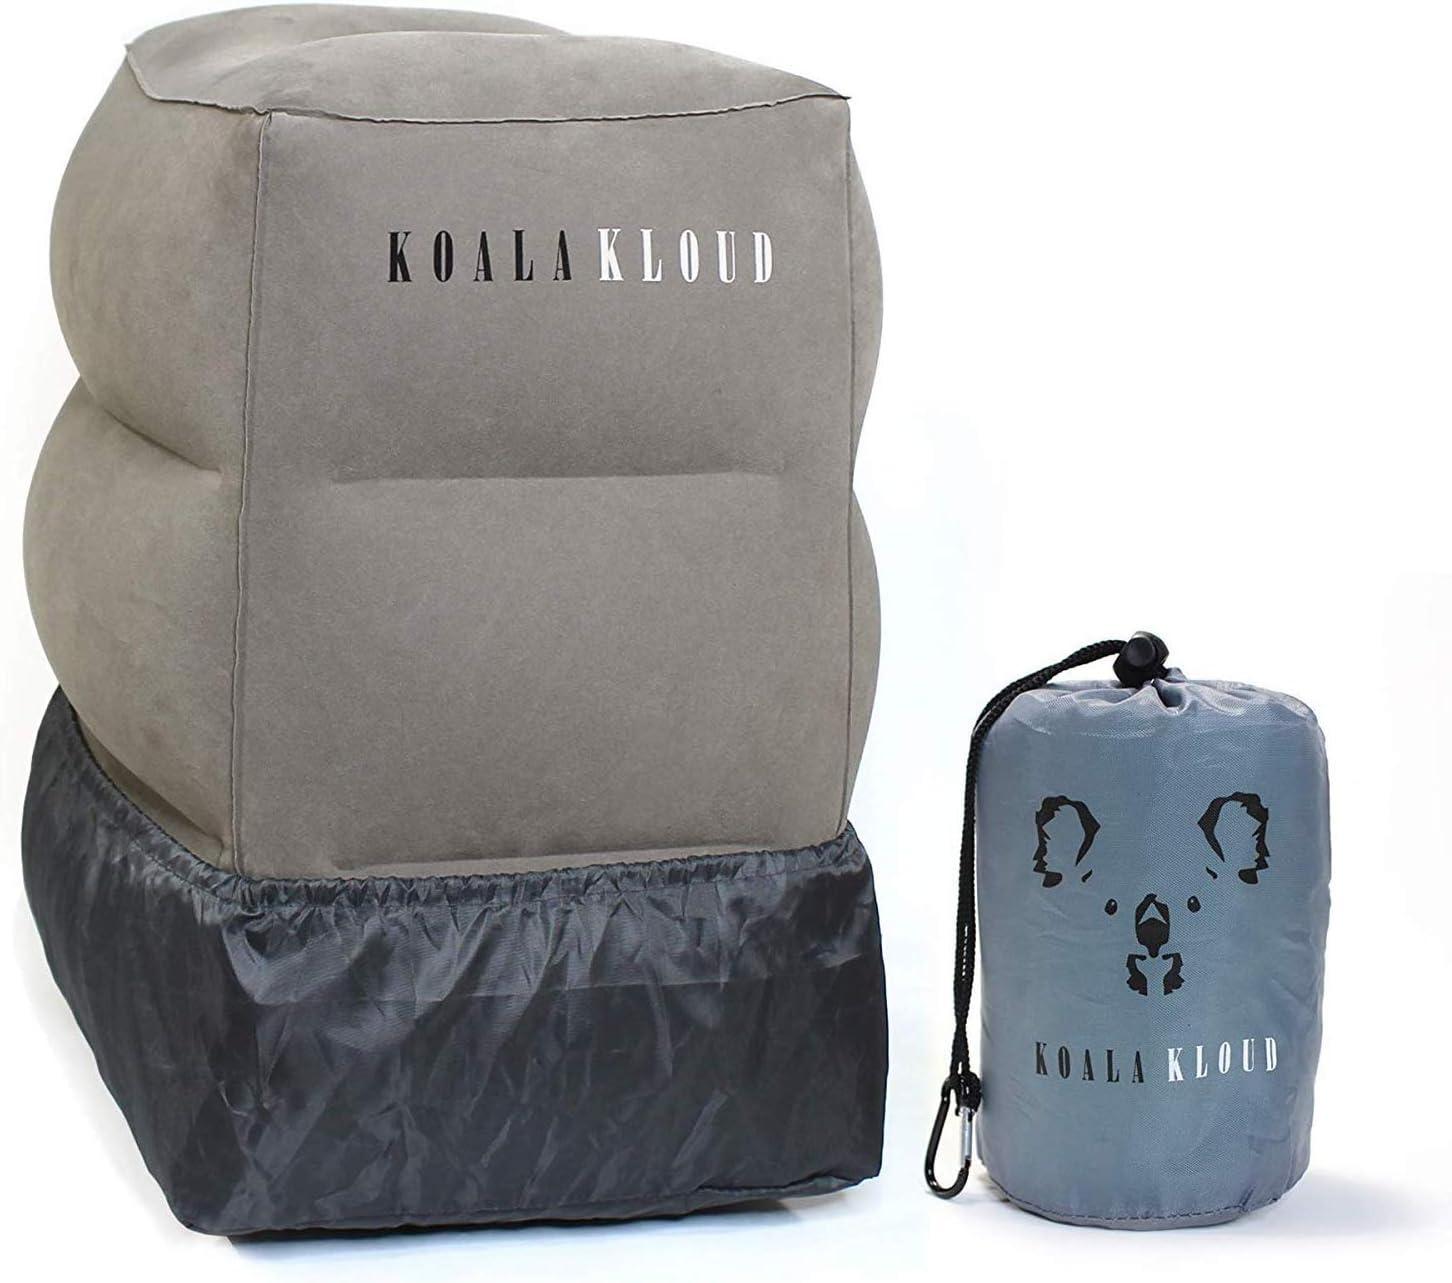 Amazon.com: Koala Kloud - Almohada hinchable para reposapiés ...